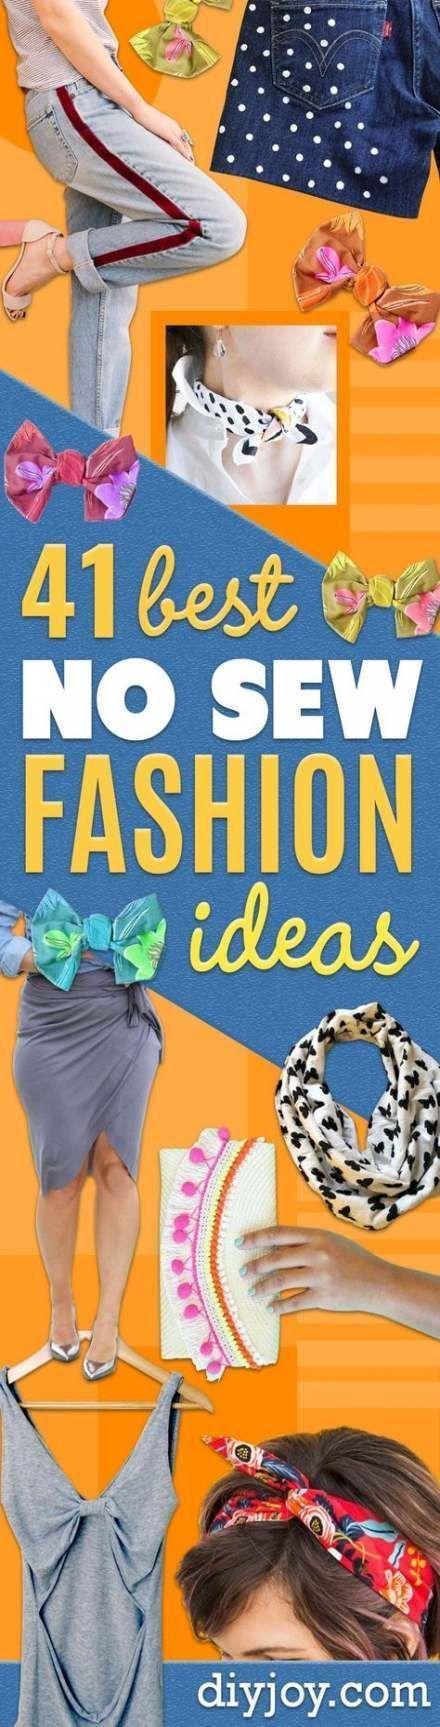 60 Ideas Clothes Diy Ideas Shirts No Sew For 2019 #nosewshirts 60 Ideas Clothes Diy Ideas Shirts No Sew For 2019 #diy #clothes... #Clothes #DIY #Ideas #Sew #Shirts #nosewshirts 60 Ideas Clothes Diy Ideas Shirts No Sew For 2019 #nosewshirts 60 Ideas Clothes Diy Ideas Shirts No Sew For 2019 #diy #clothes... #Clothes #DIY #Ideas #Sew #Shirts #nosewshirts